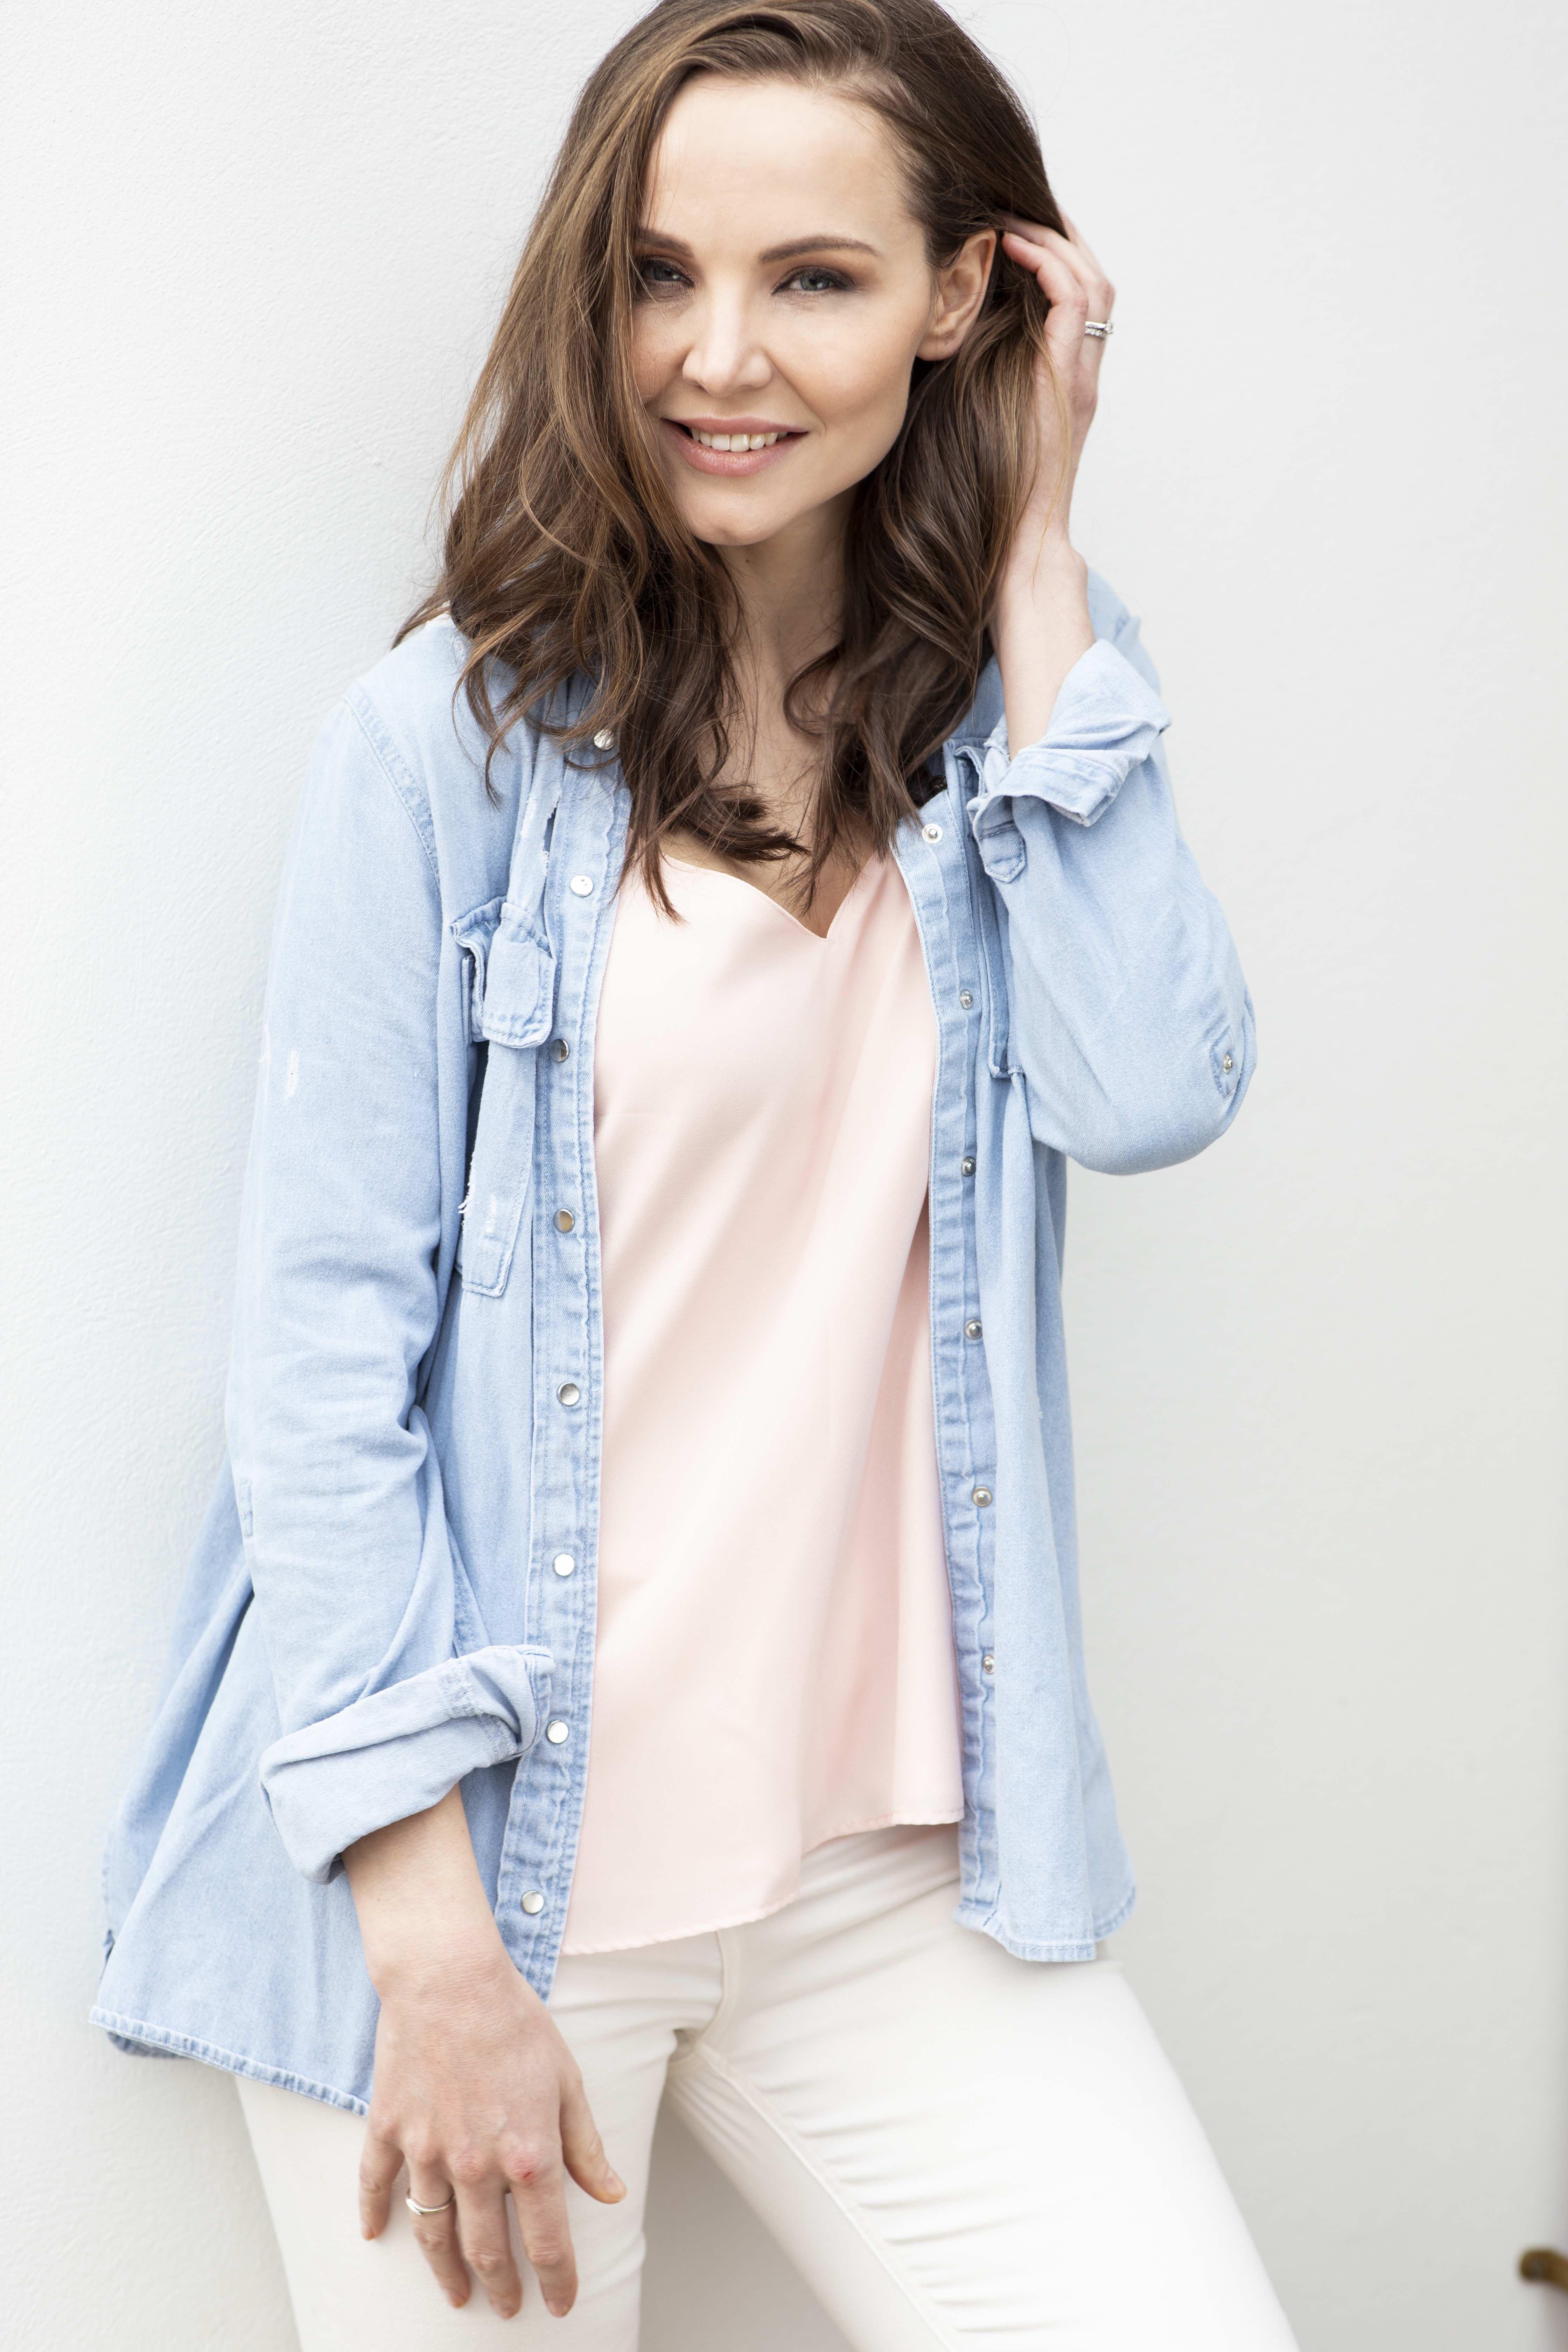 Web-Shine-Female-Model-Louise-Manchester-Leeds-Mature-Classic-Lifestyle-06.jpg#asset:48751